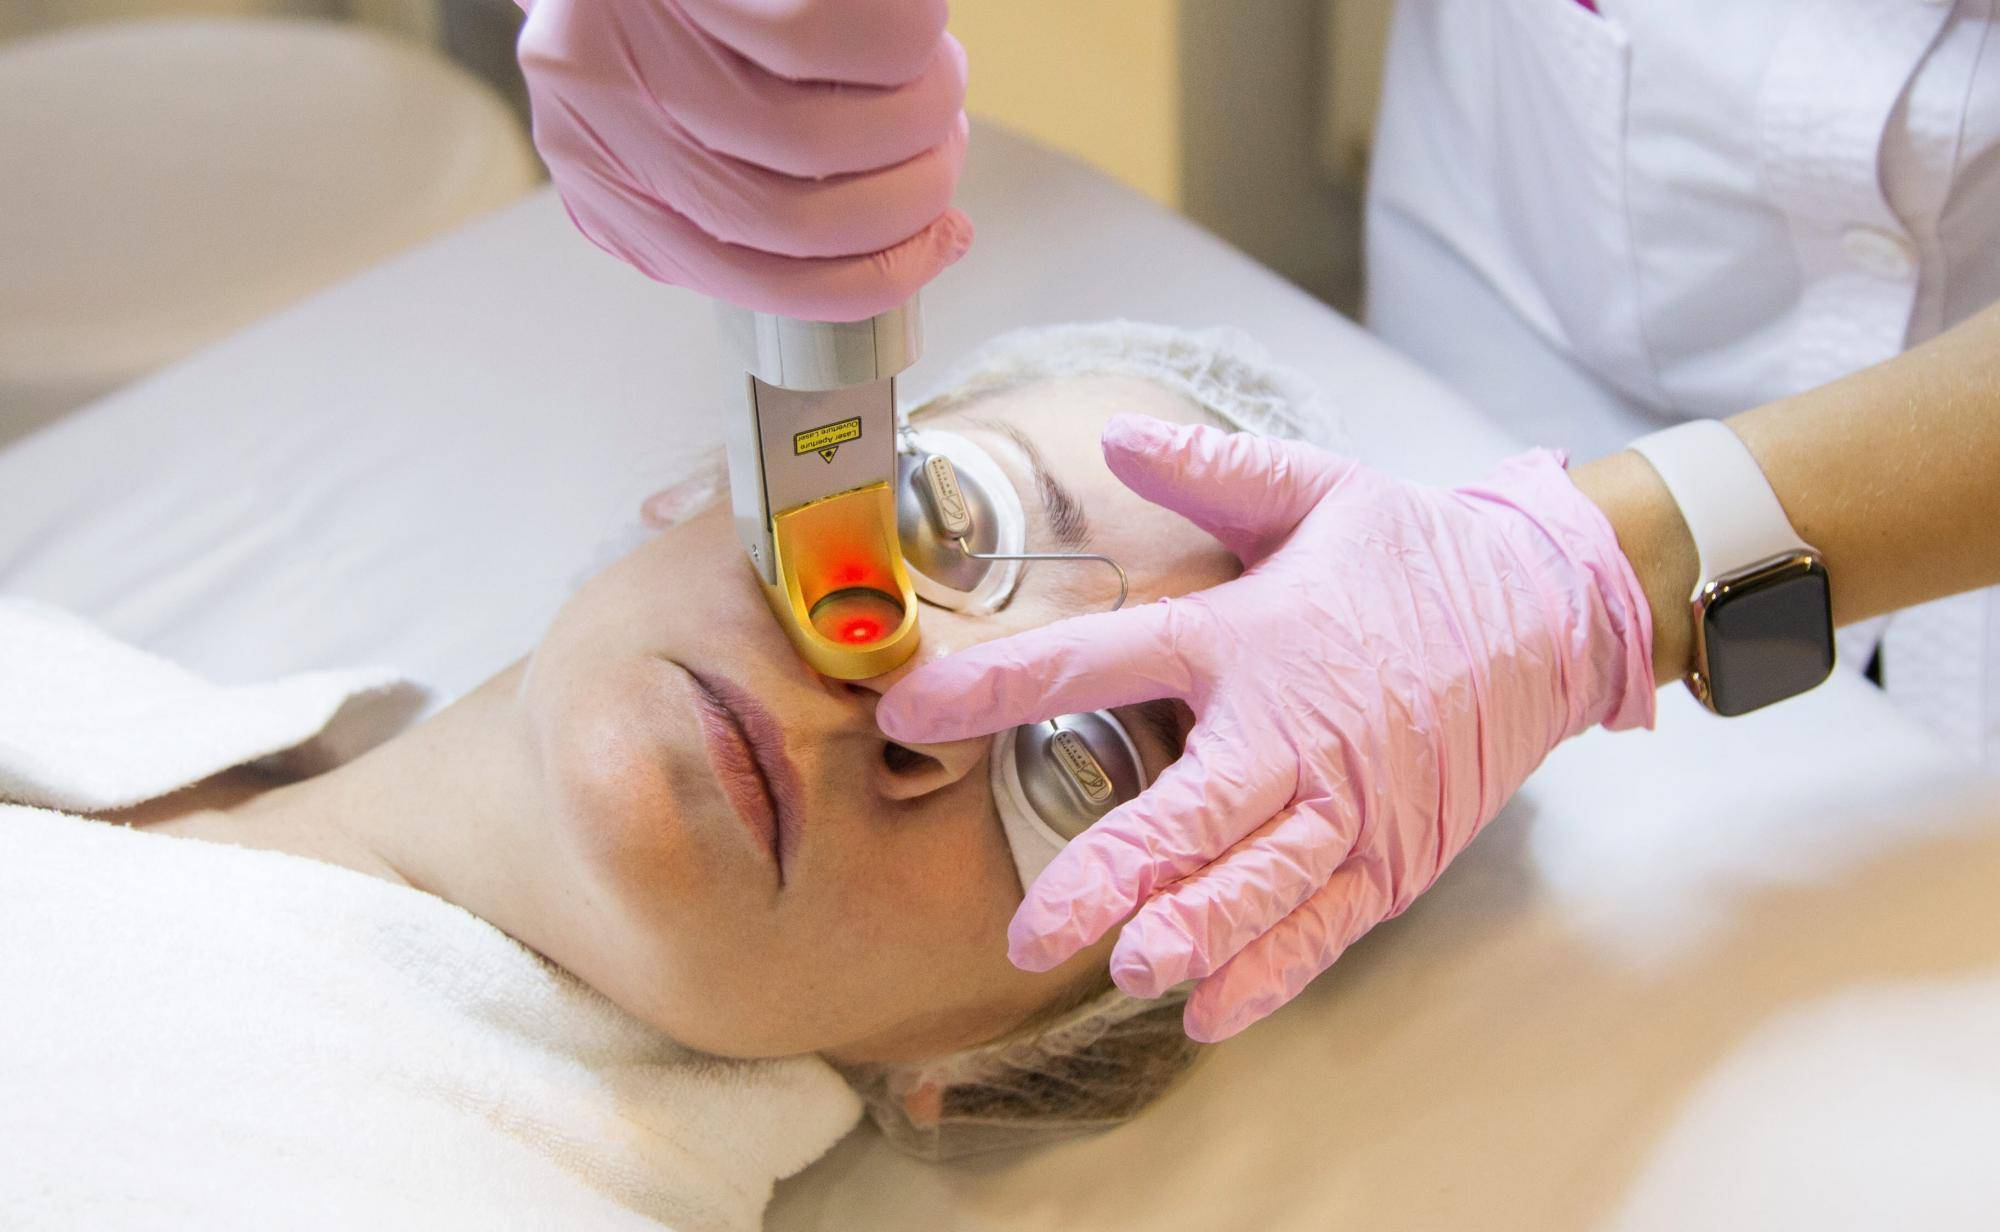 Удаление купероза на лице аппаратом м22